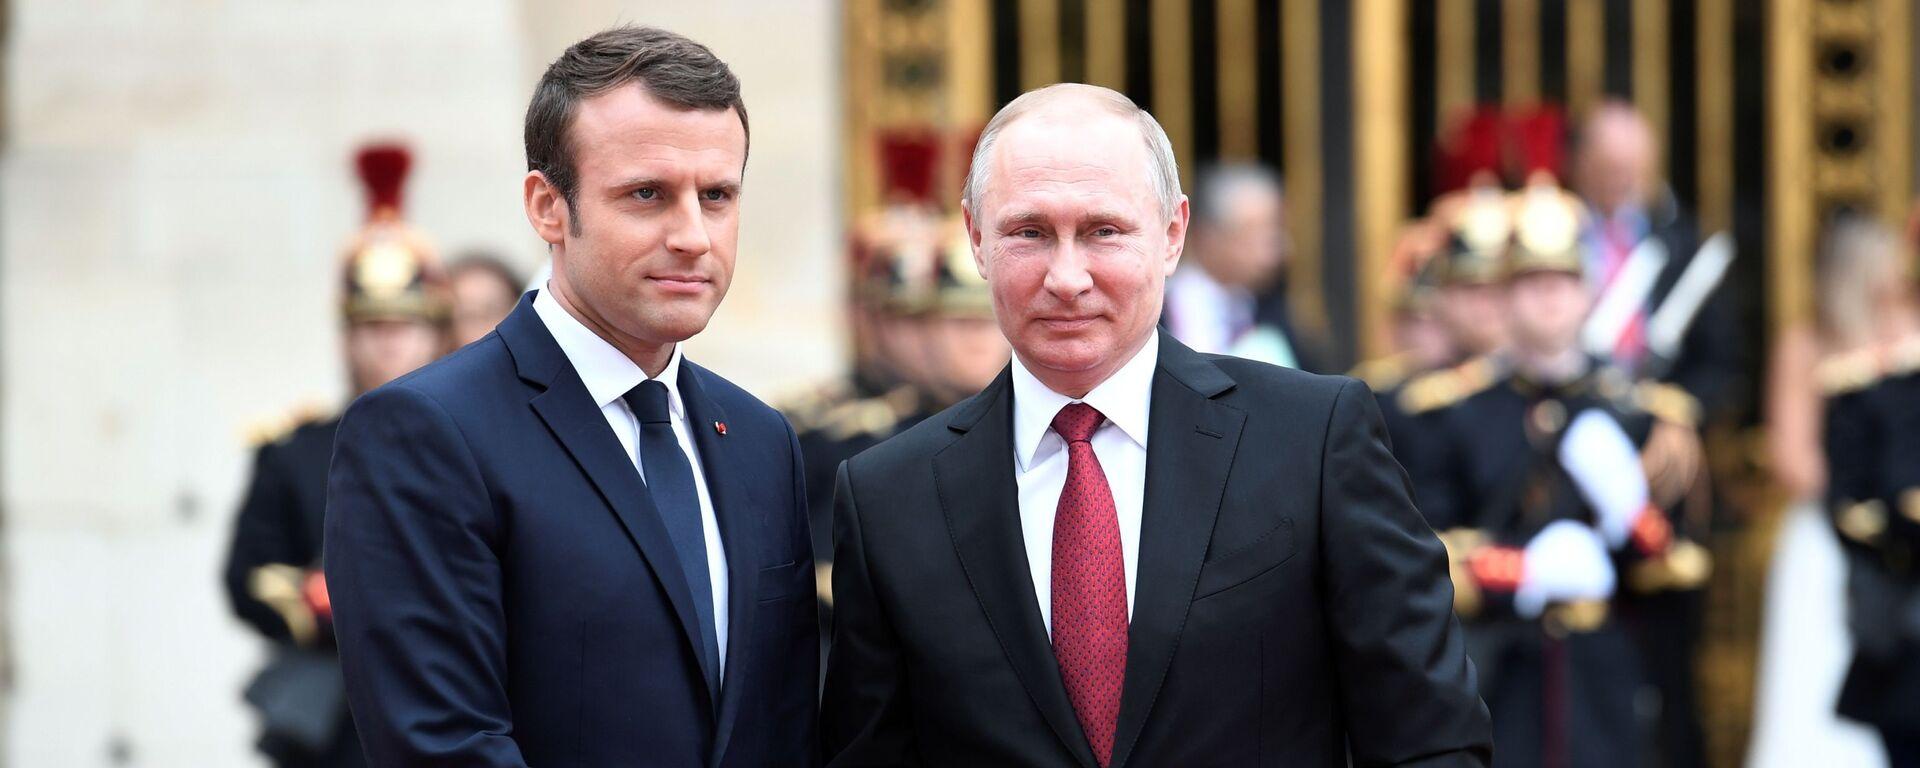 Prezidenti Ruska a Francie Vladimir Putin a Emmanuel Macron - Sputnik Česká republika, 1920, 26.04.2021